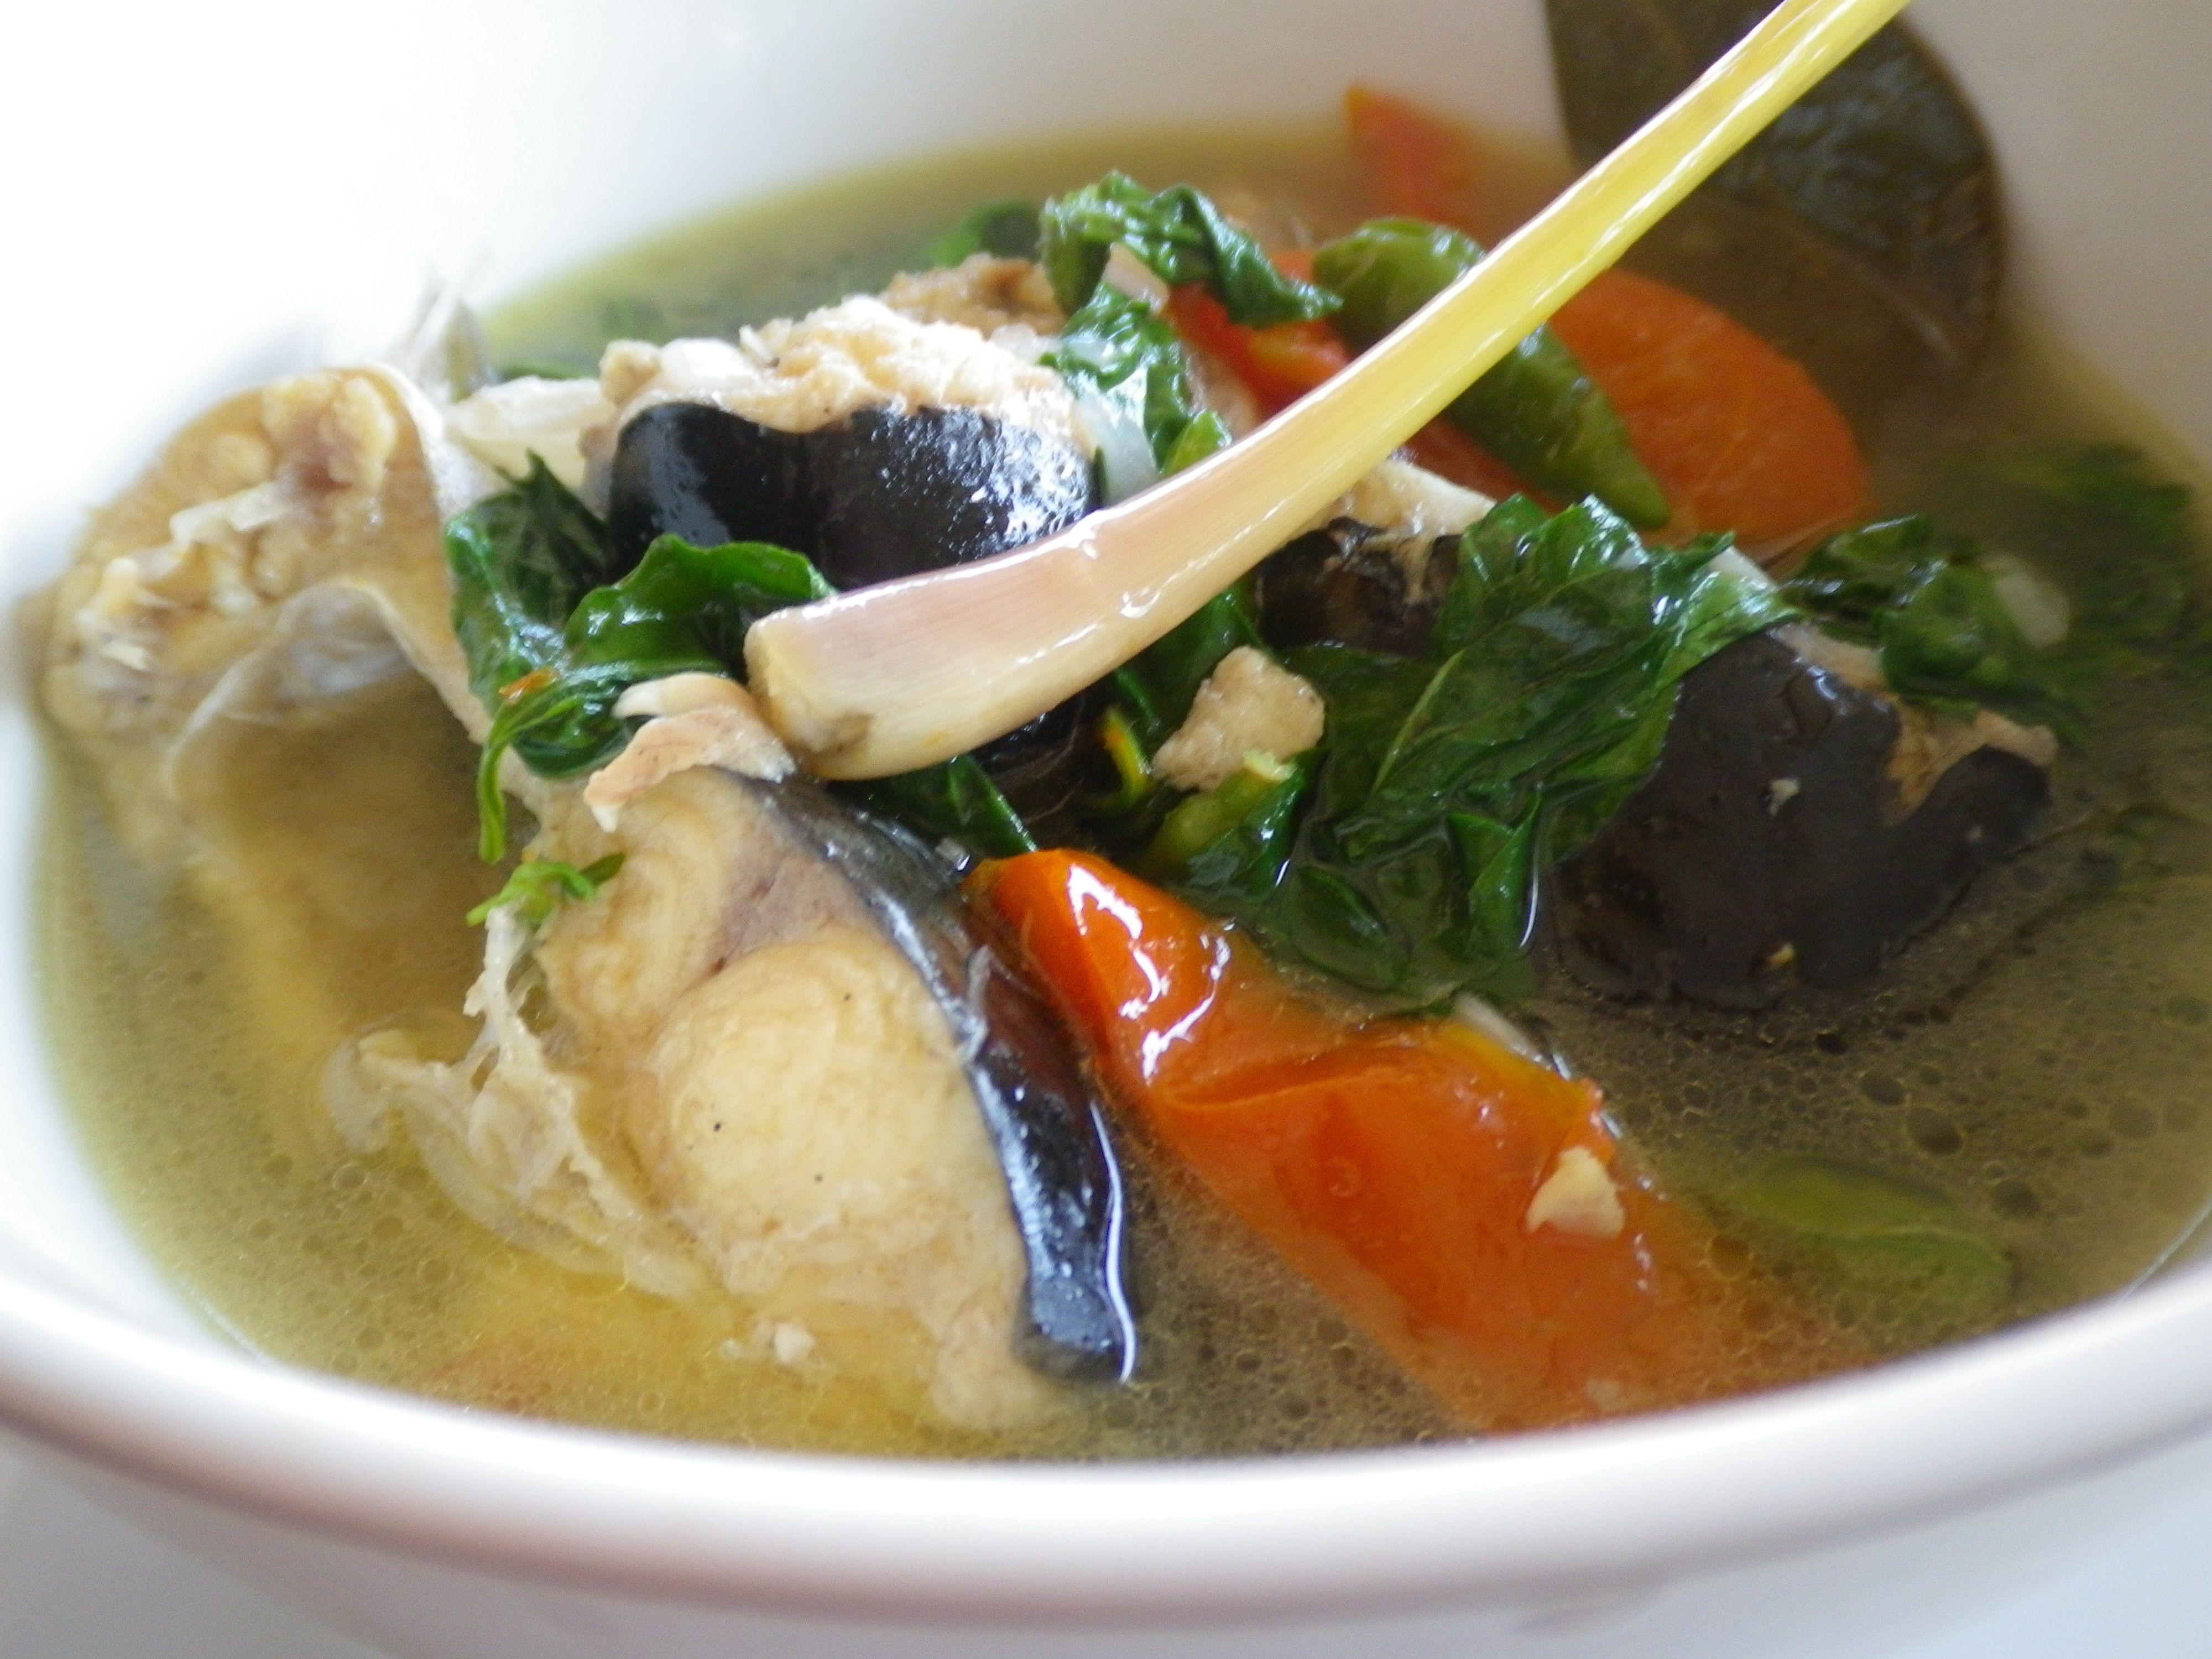 Patinsons Soup Sup Ikan Patin Sharkcatfish Patin Onion Garlic Ginger Lemongrass Tomato Indoba Resep Resep Masakan Asia Resep Masakan Indonesia